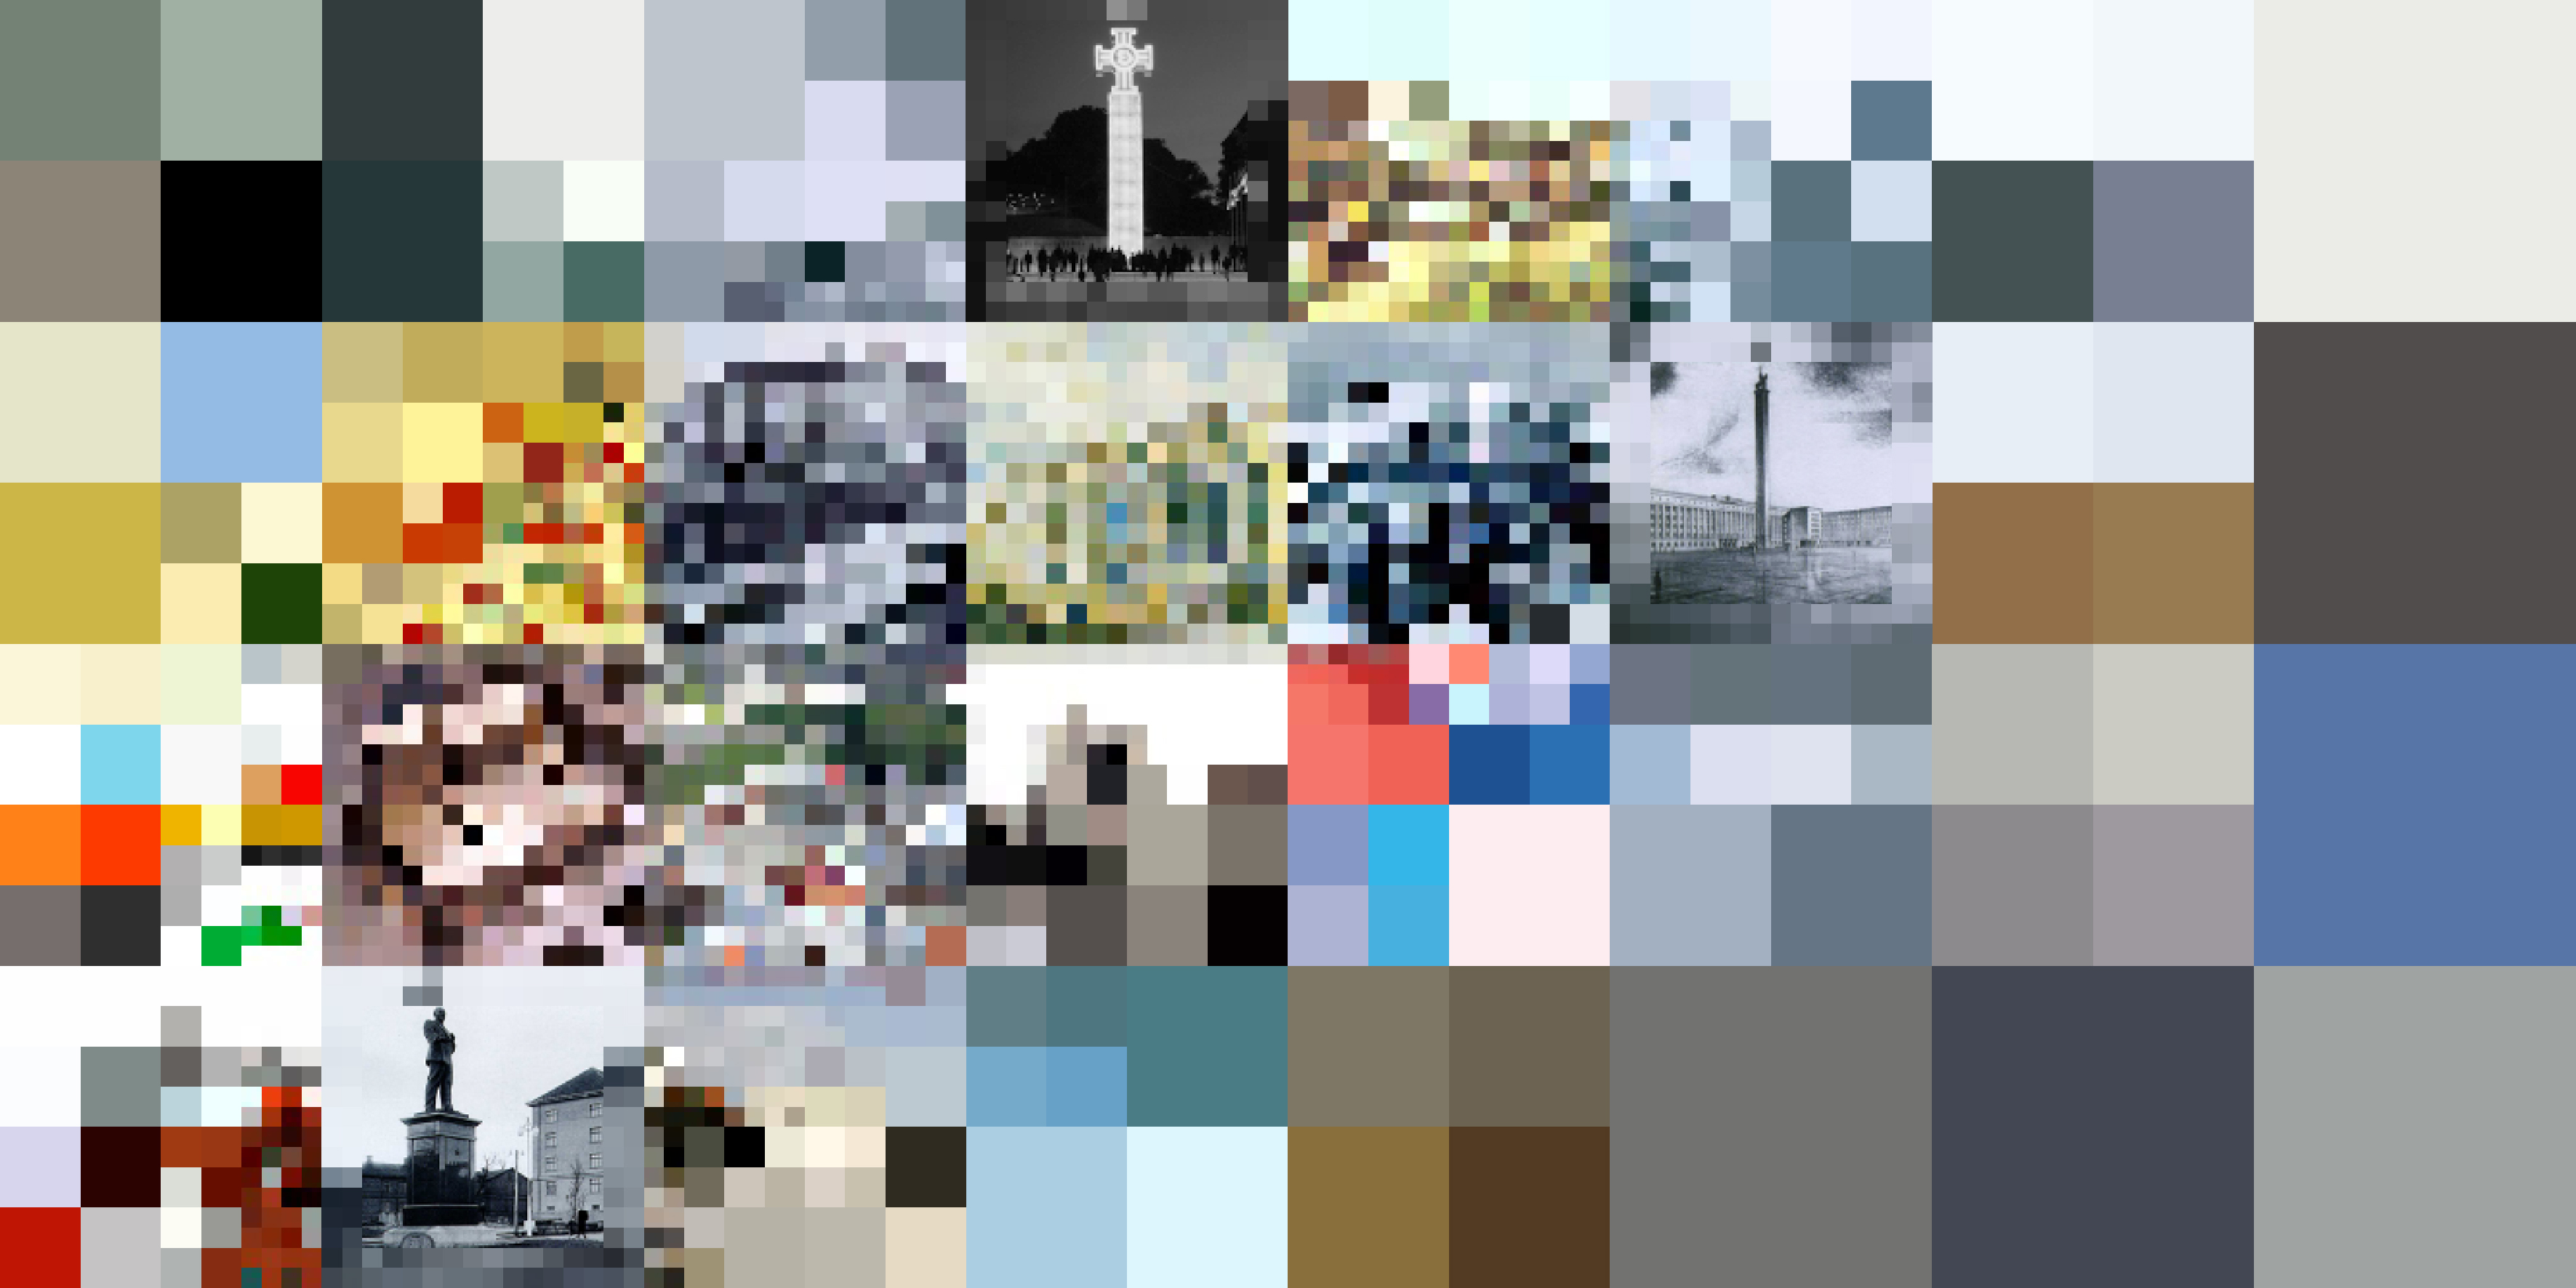 ESTONIA_Interspace_pixel_field_by_Interspace